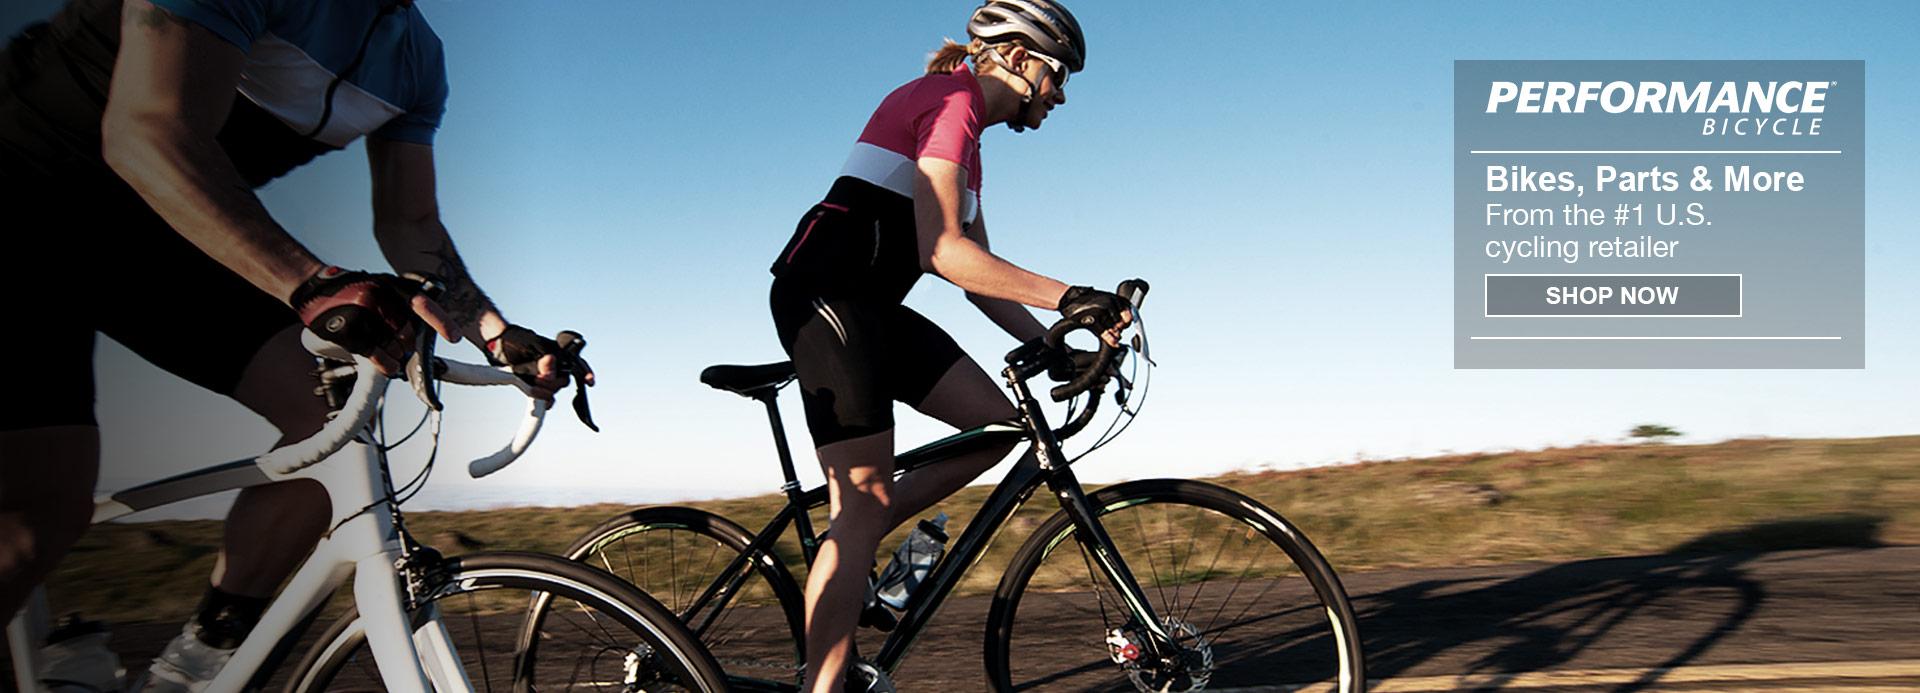 Performance Bikes on Amazon.com